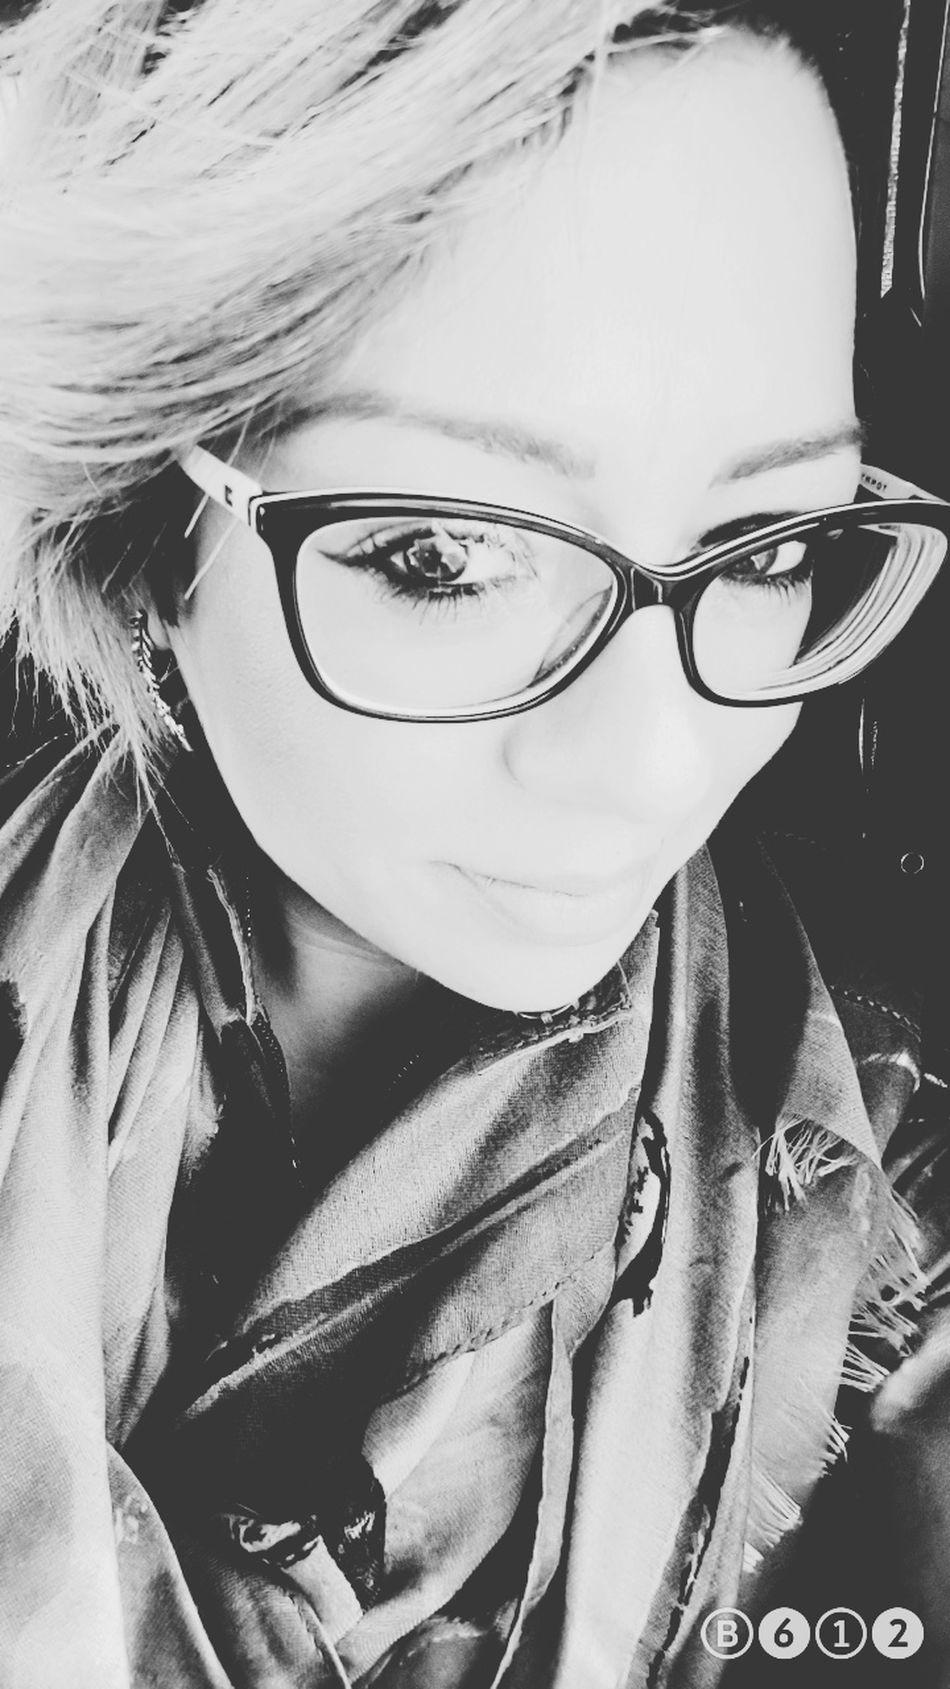 Smile.... i m ok... Portrait Eyeglasses  Illbeok EyeEm Gallery Uglygirl  Today's Hot Look Goodmorning EyeEm  Goodmorning Smile Happiness Believe Smile ✌ ThatsMe Samsungs7edge OpenEdit One Woman Only Style ✌ Thatsme ❤️ Blonde Hair Hi Helloworld EyeEm Bnw Bnwportrait